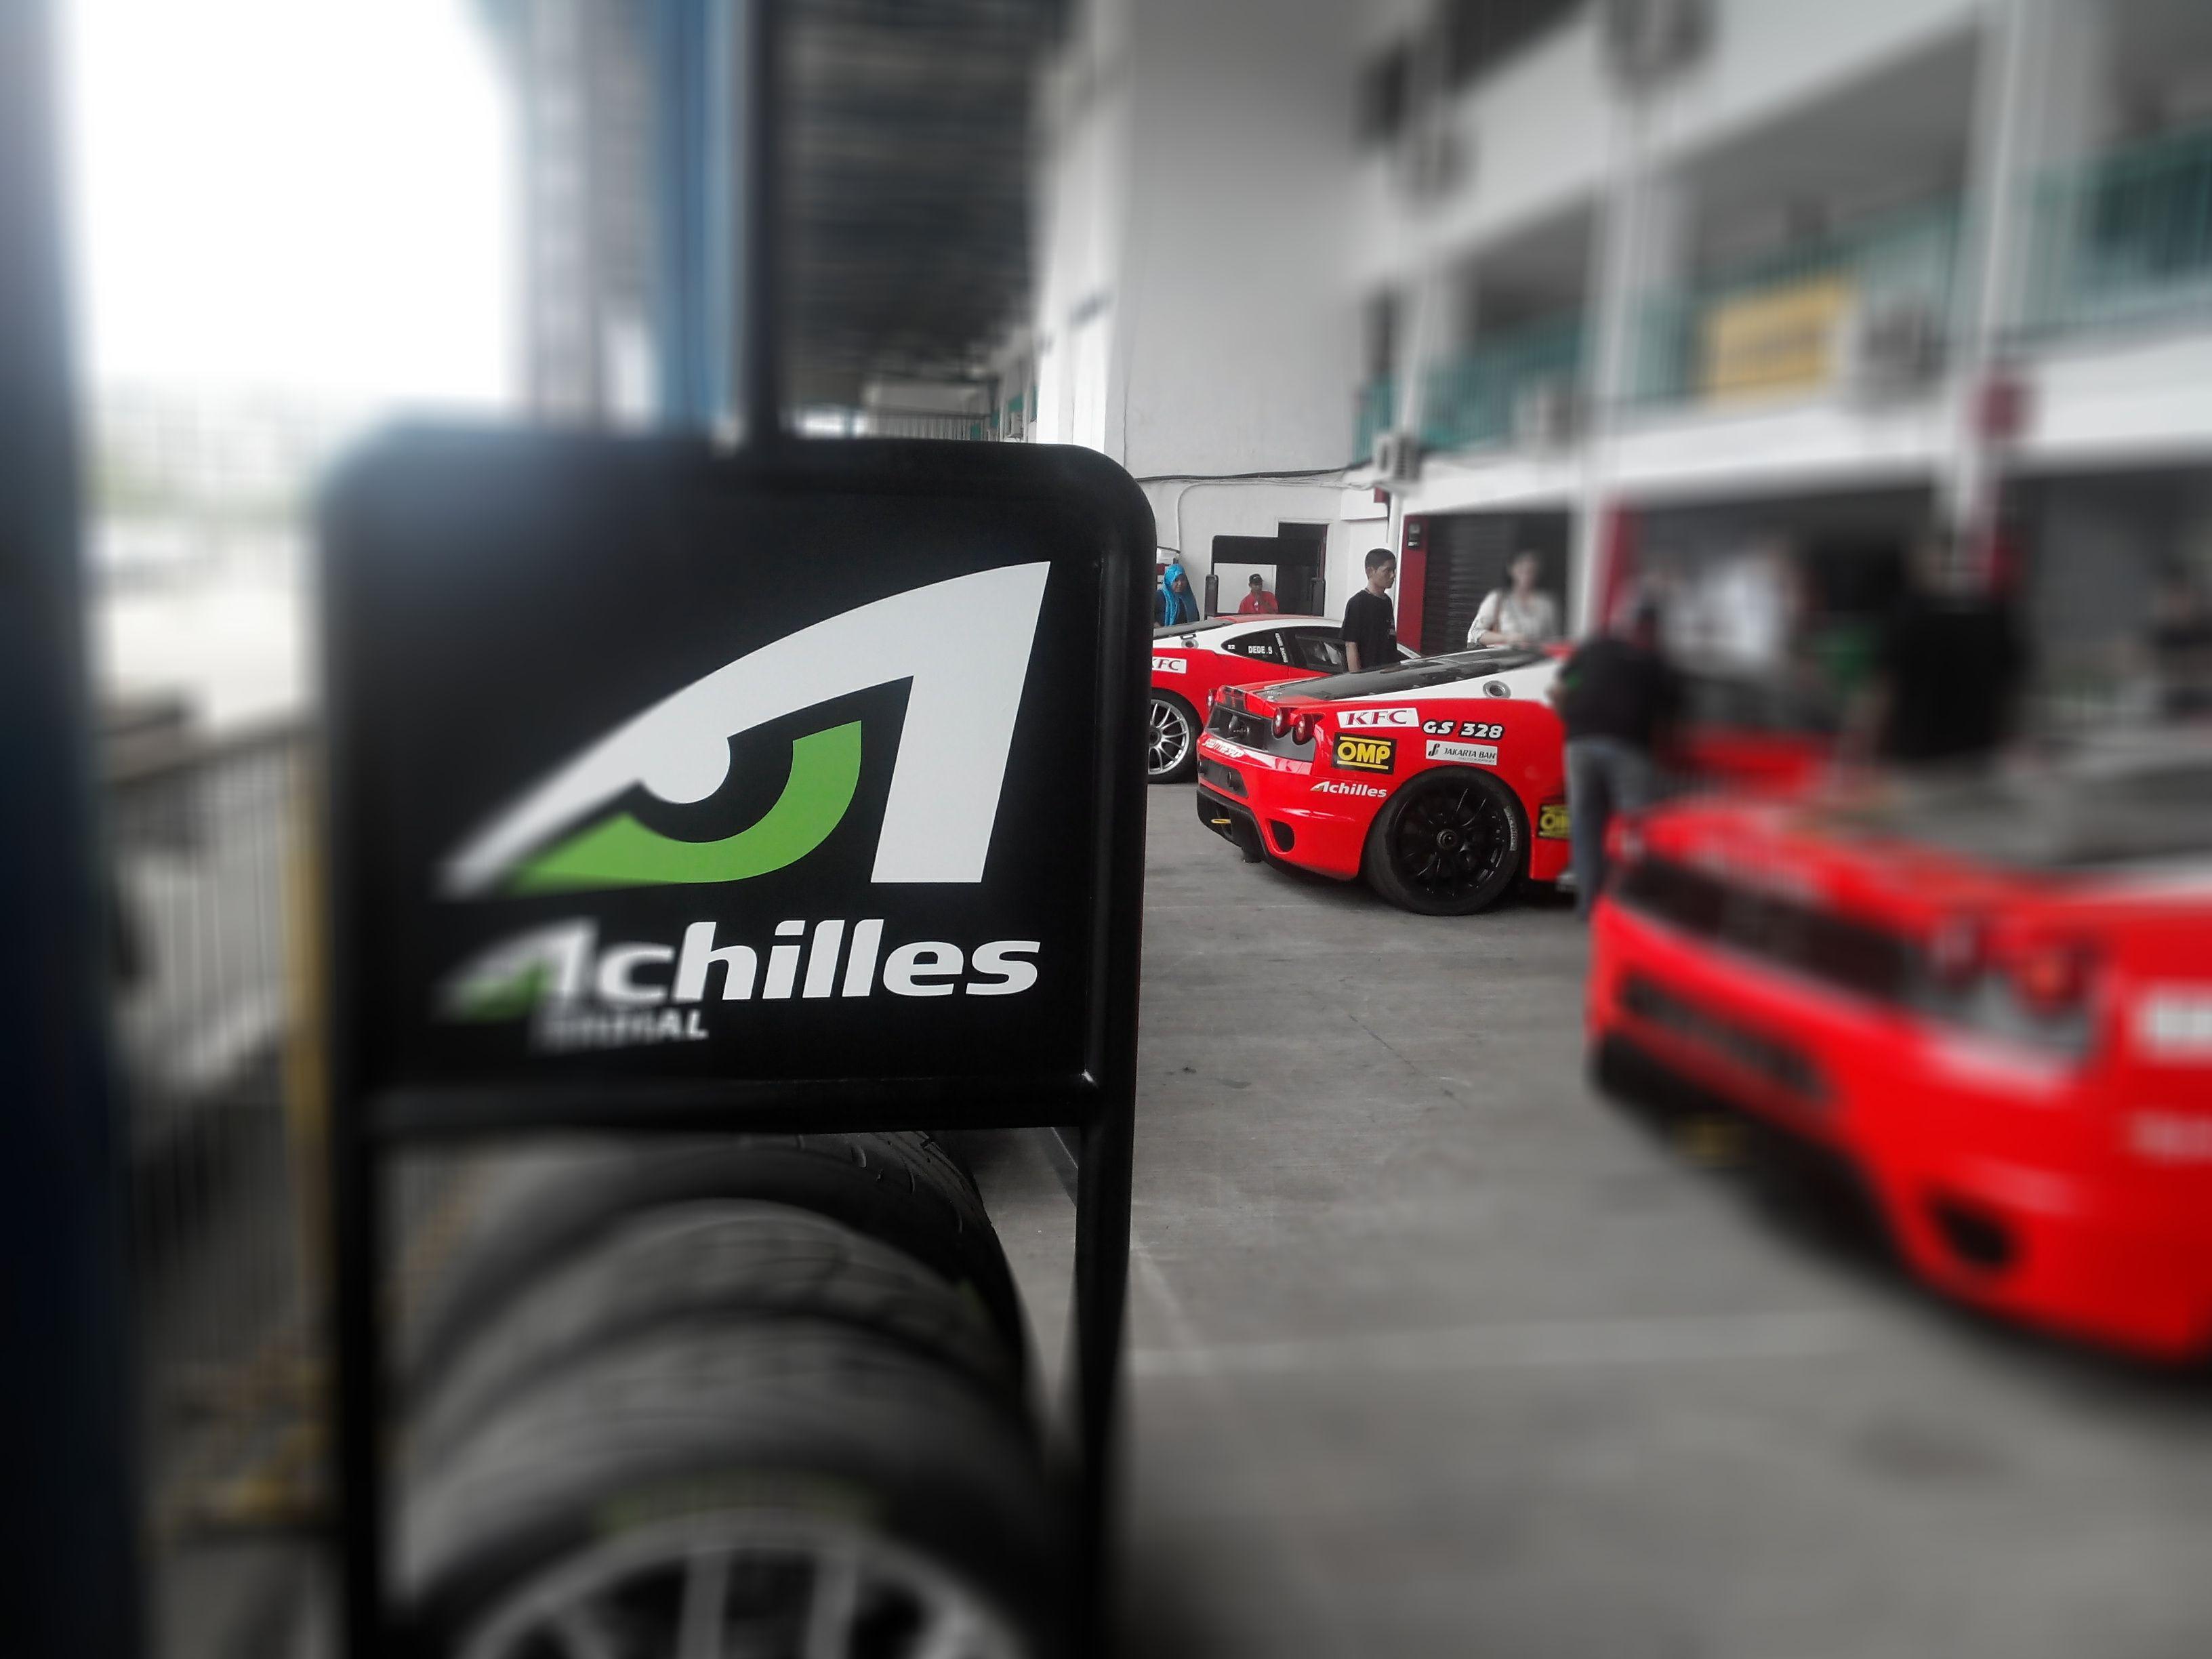 Ferrari F430 Competizione Indonesia AchillesRadial